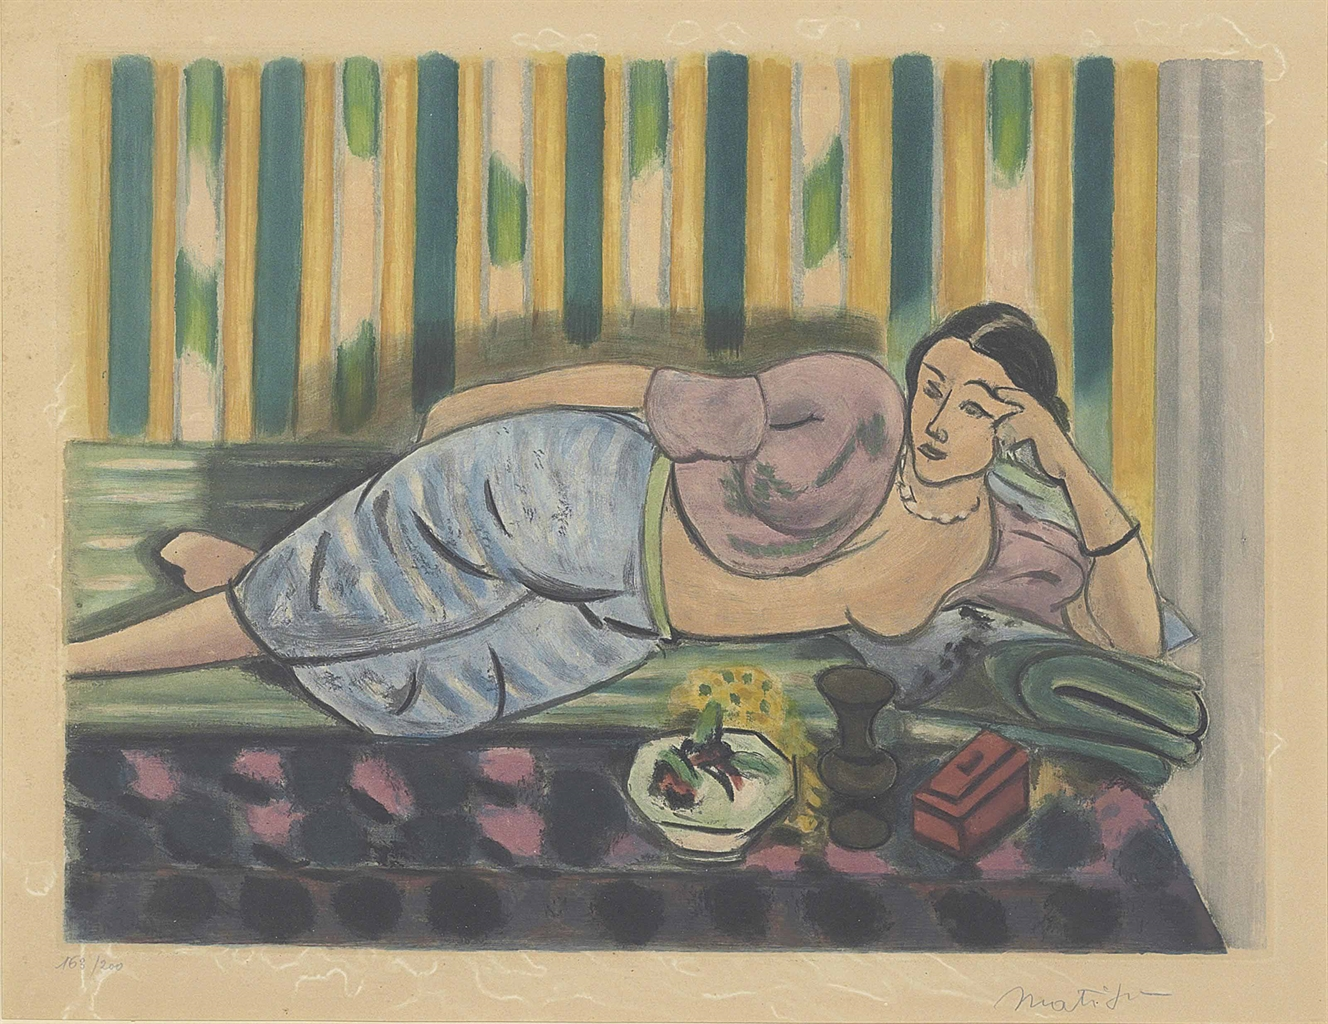 Henri Matisse-After Henri Matisse - Odalisque au coffret rouge-1926